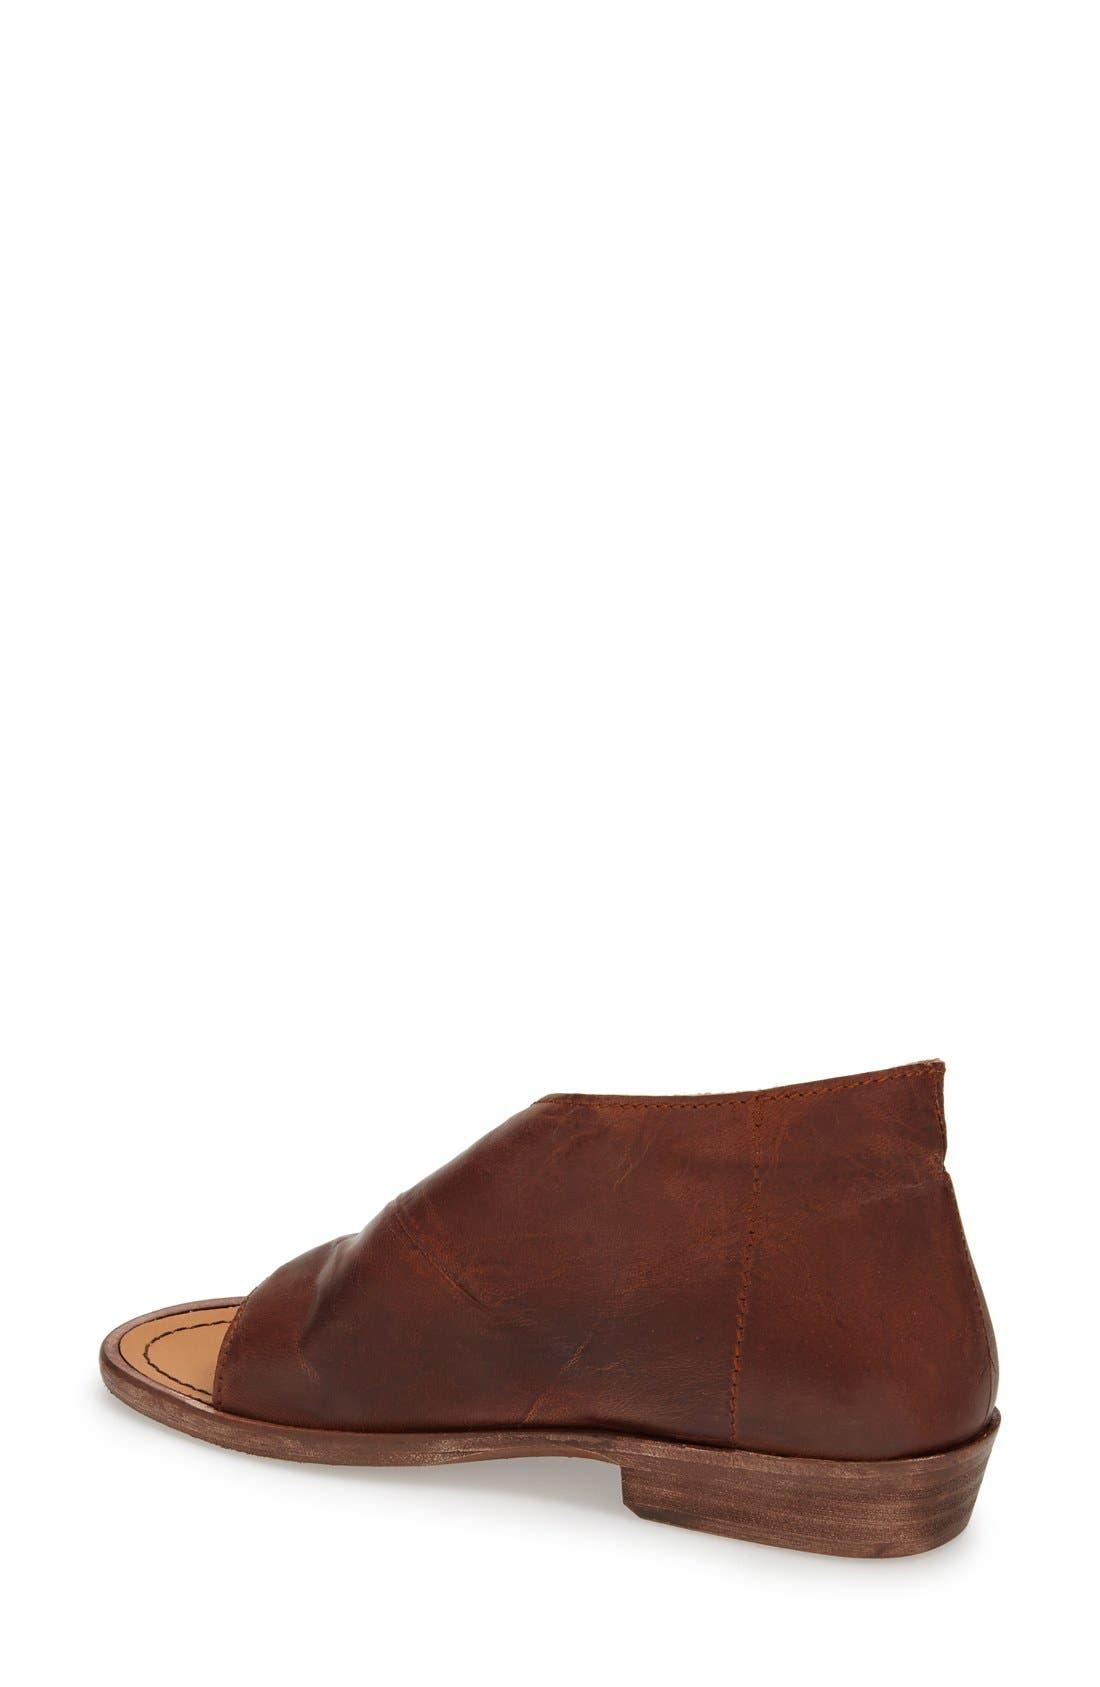 'Mont Blanc' Asymmetrical Sandal,                             Alternate thumbnail 38, color,